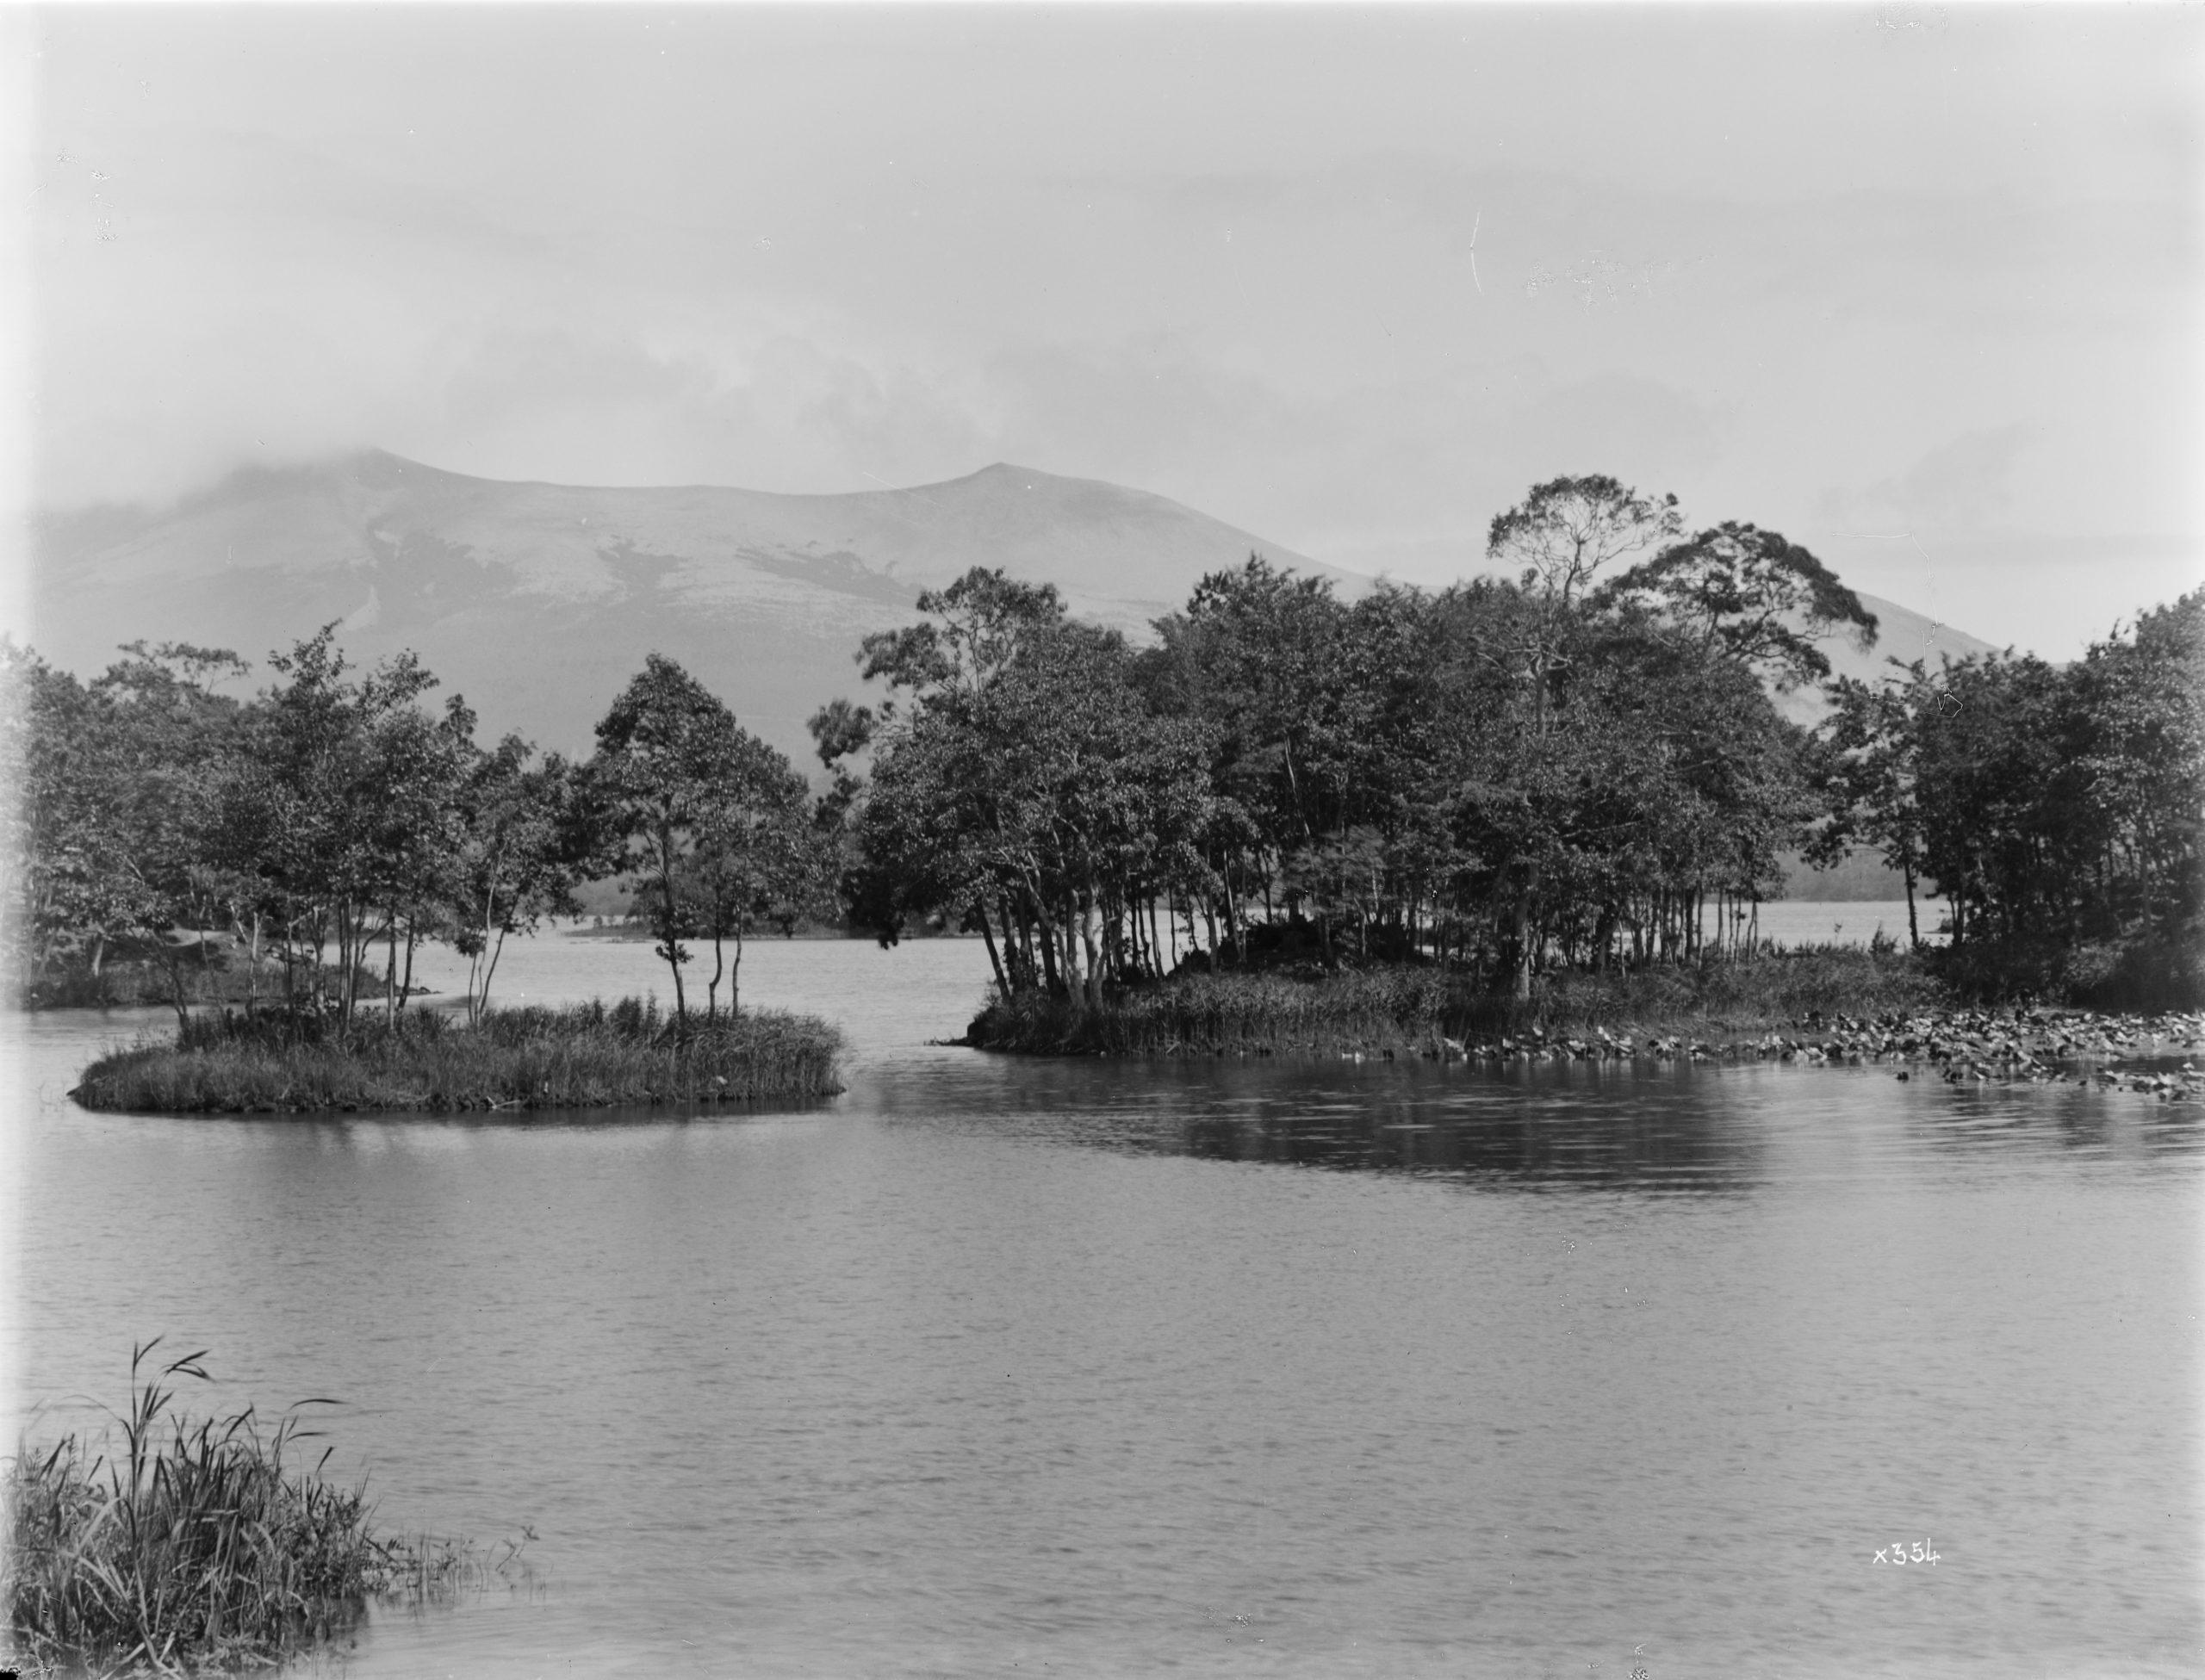 Ernest Wilson photographed this view of Lake Onuma, Hokkaido. The islands contained coppiced Manchurian alders (Alnus hirsuta) and Mongolian oaks (Quercus mongolica var. grosseserrata). Hokkaido Koma-ga-take volcano may be seen beyond.